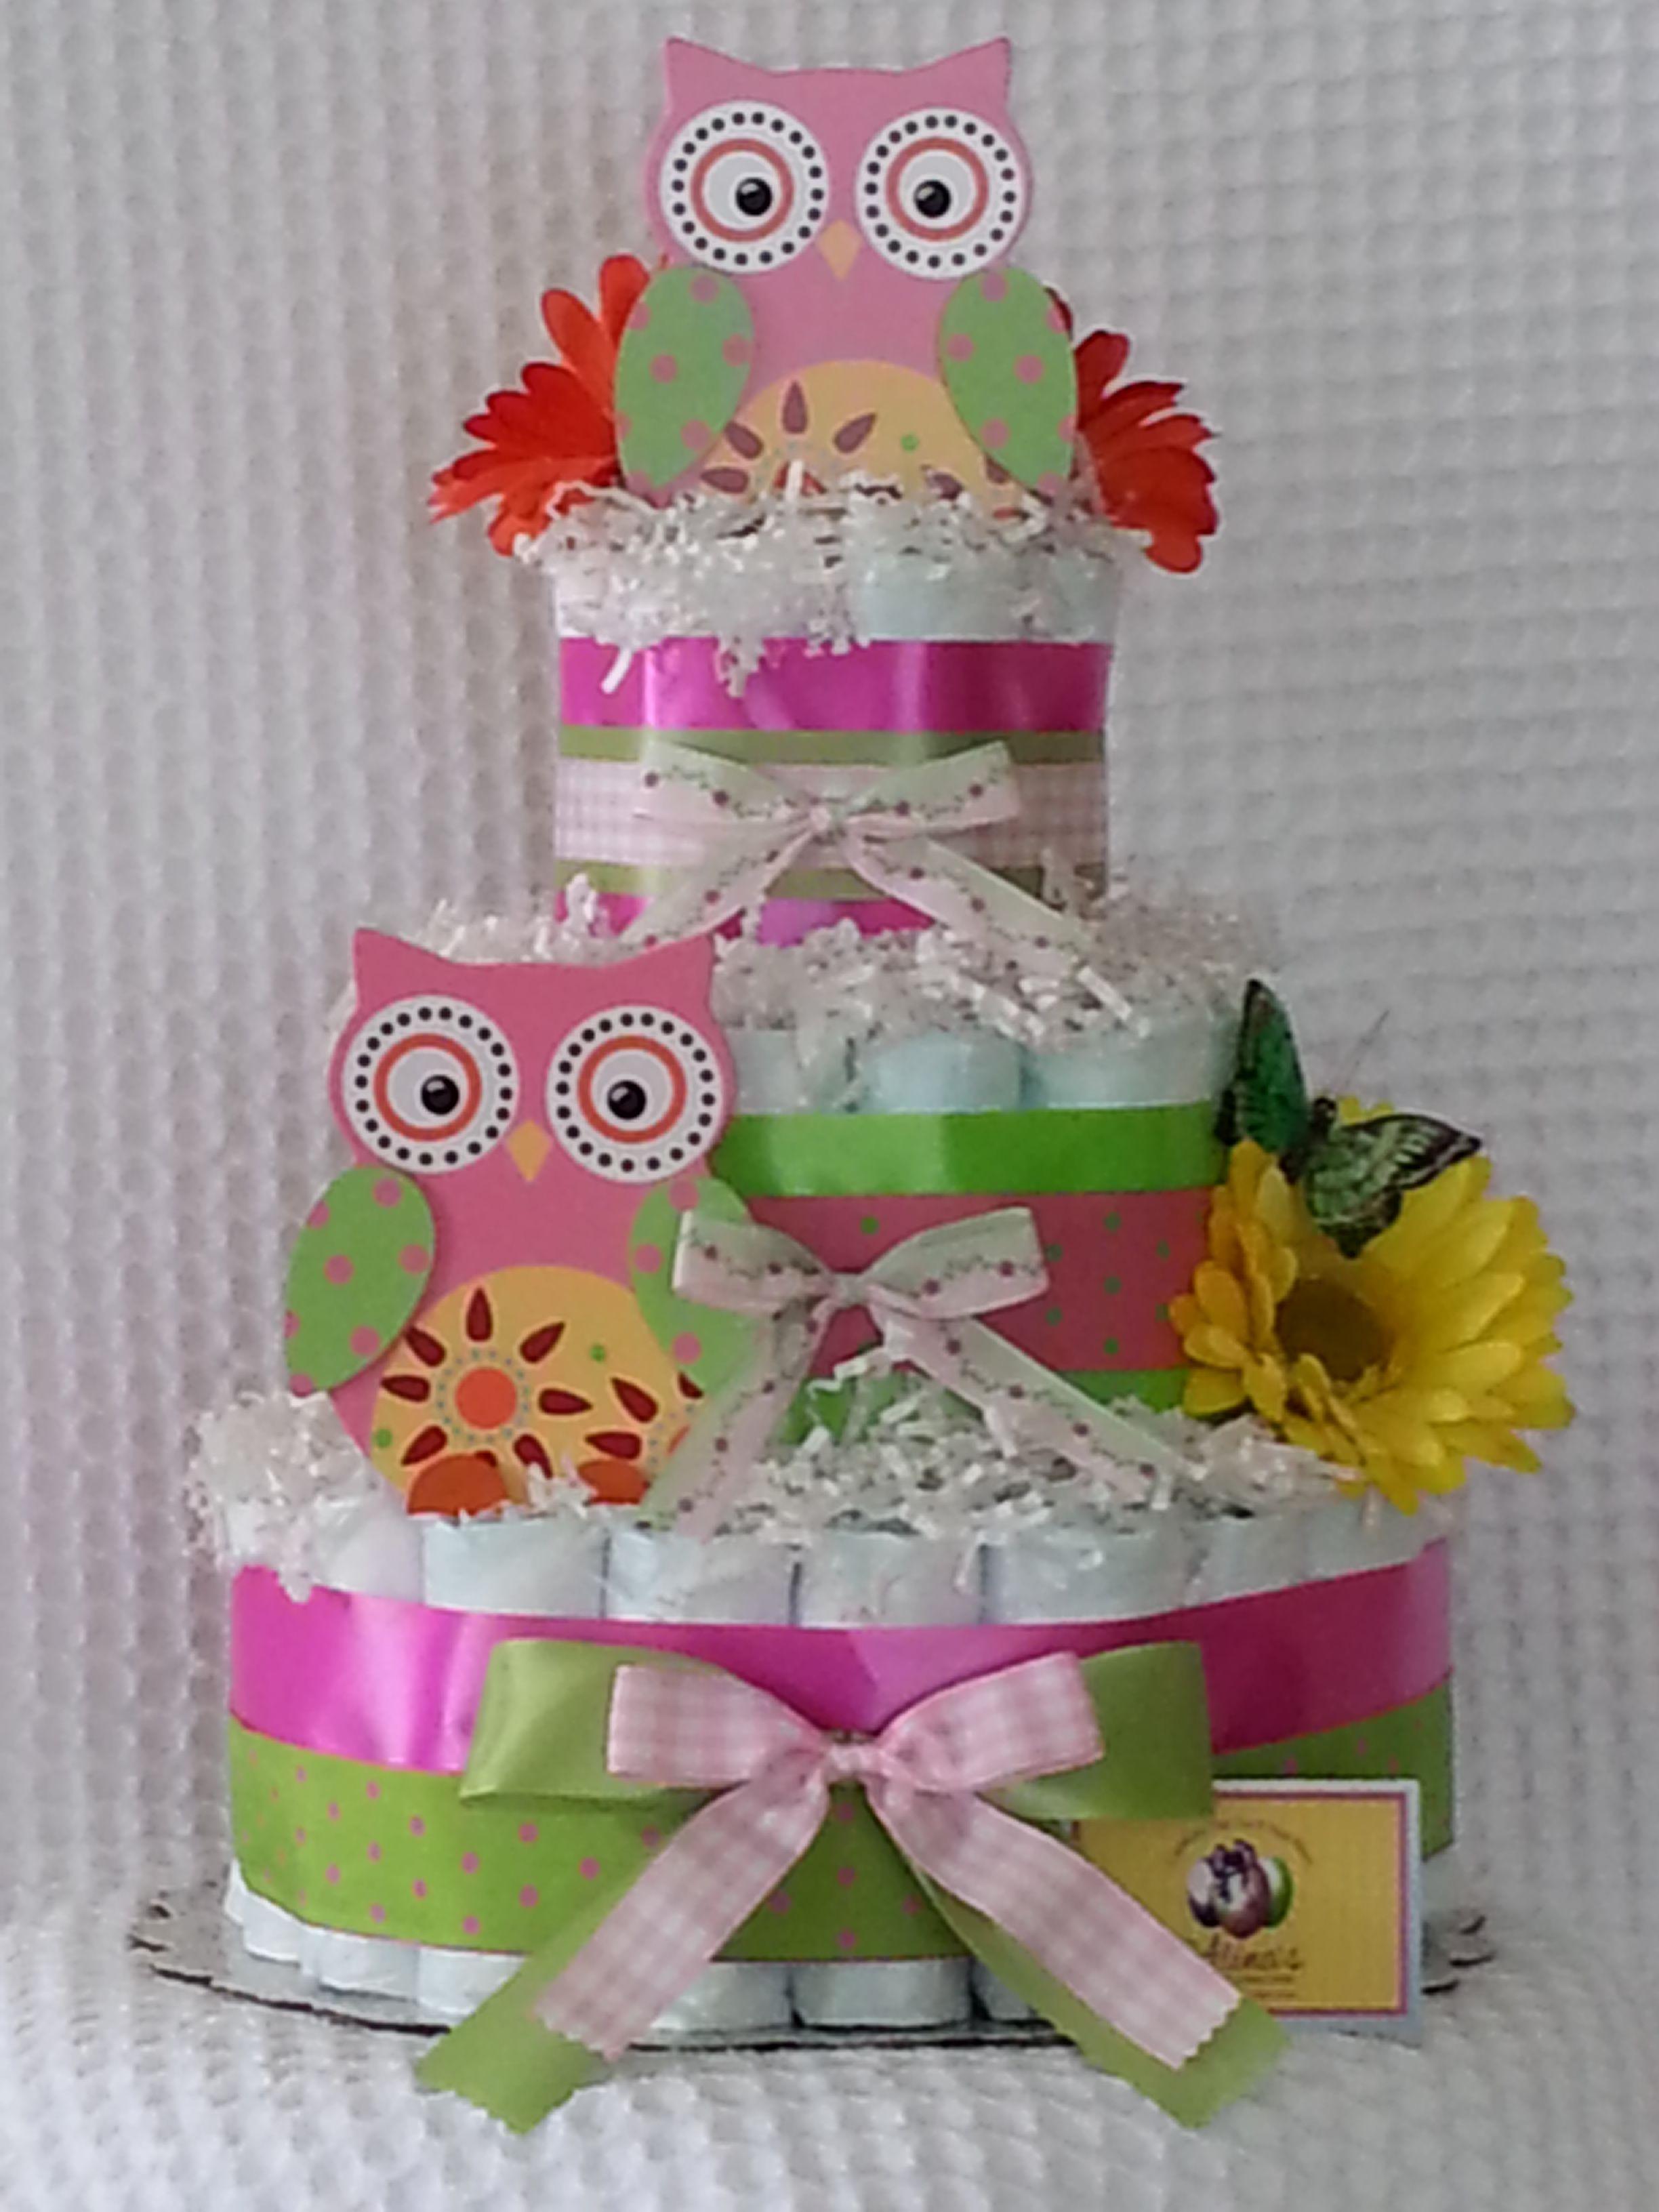 Hoot hoot girl owl diaper cake 3 tier rolled style heymeone hoot hoot girl owl diaper cake 3 tier rolled style heymeone baditri Gallery